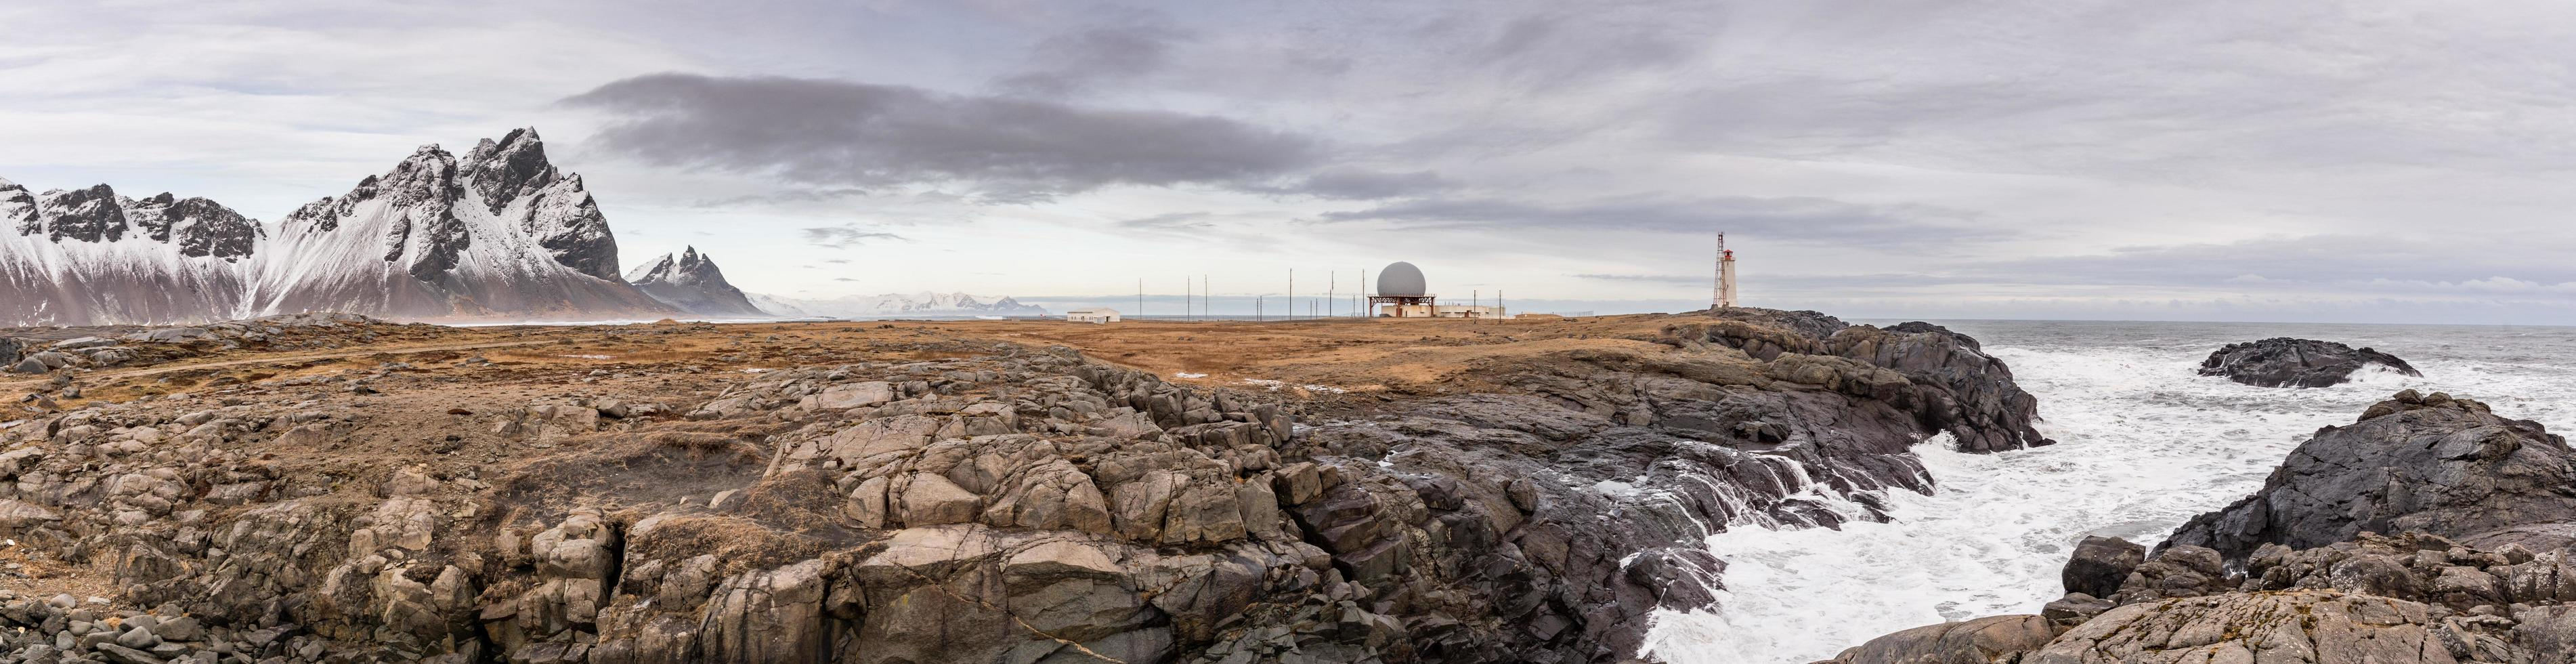 panorama di stokksnes nel parco nazionale di vatnajokull in Islanda foto